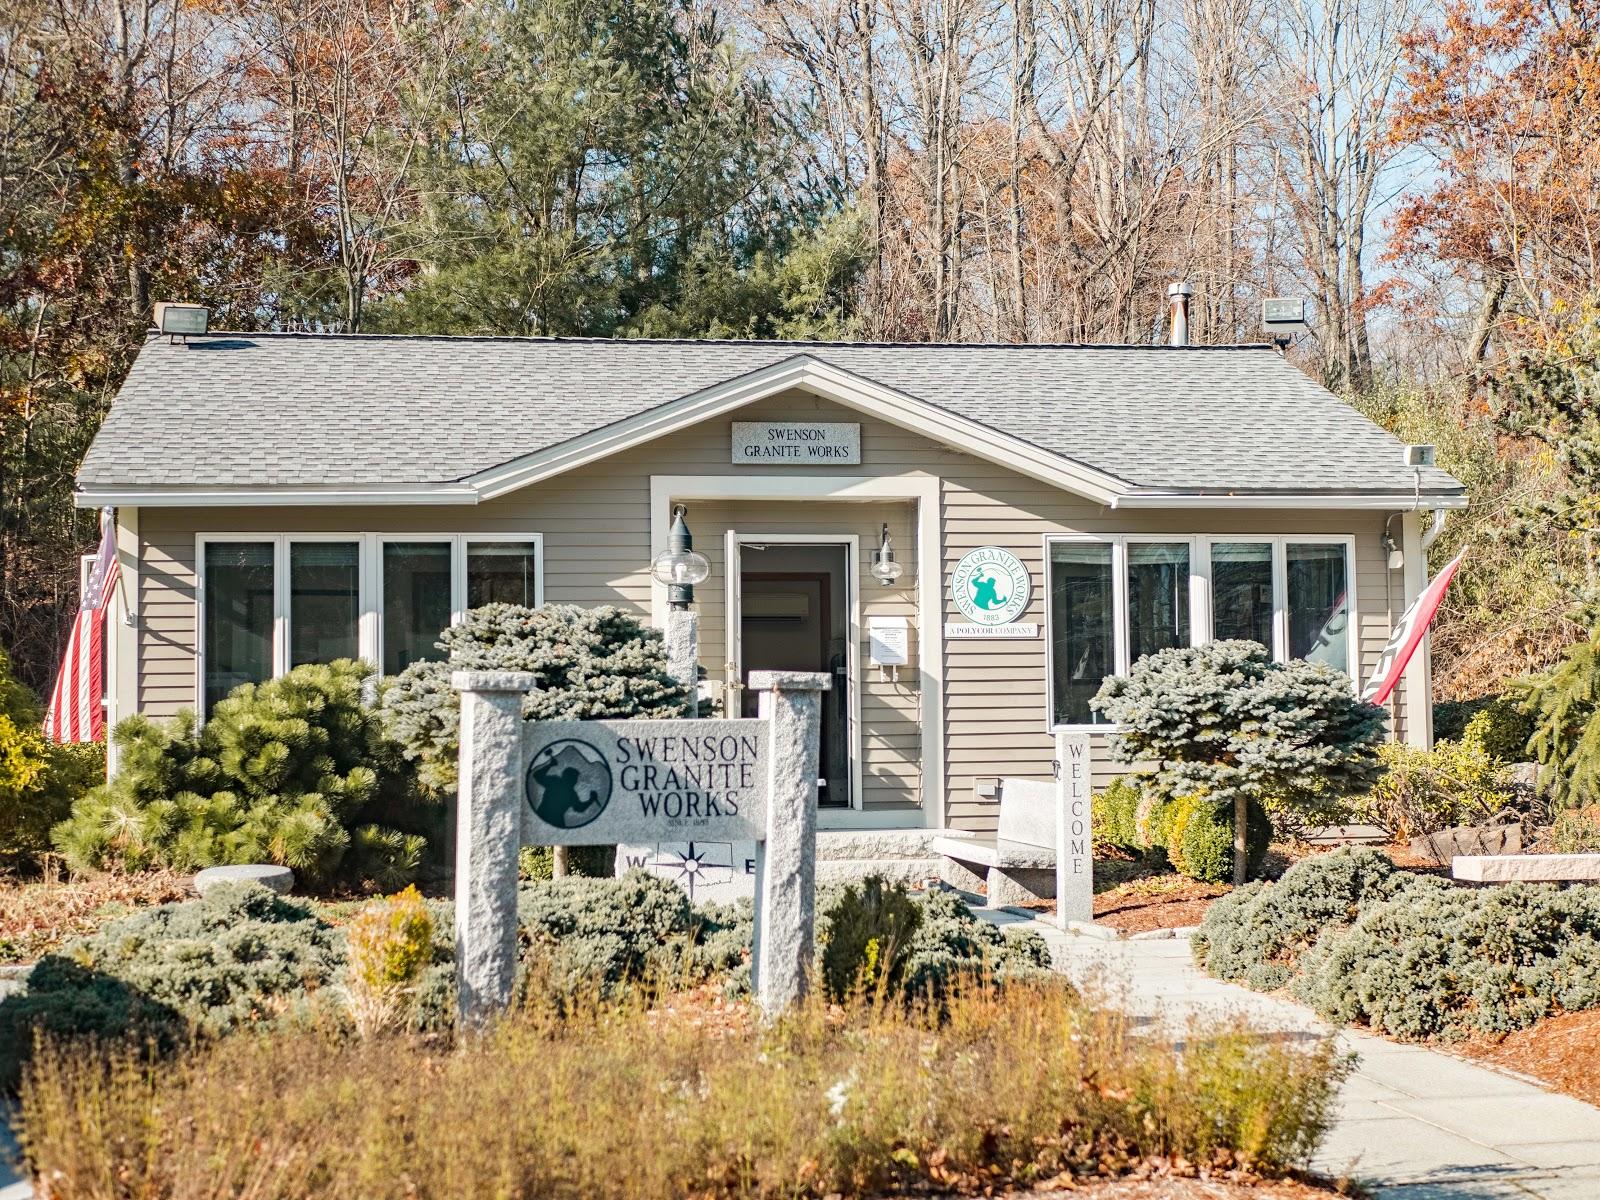 Swenson Granite Works Newtown, Connecticut store